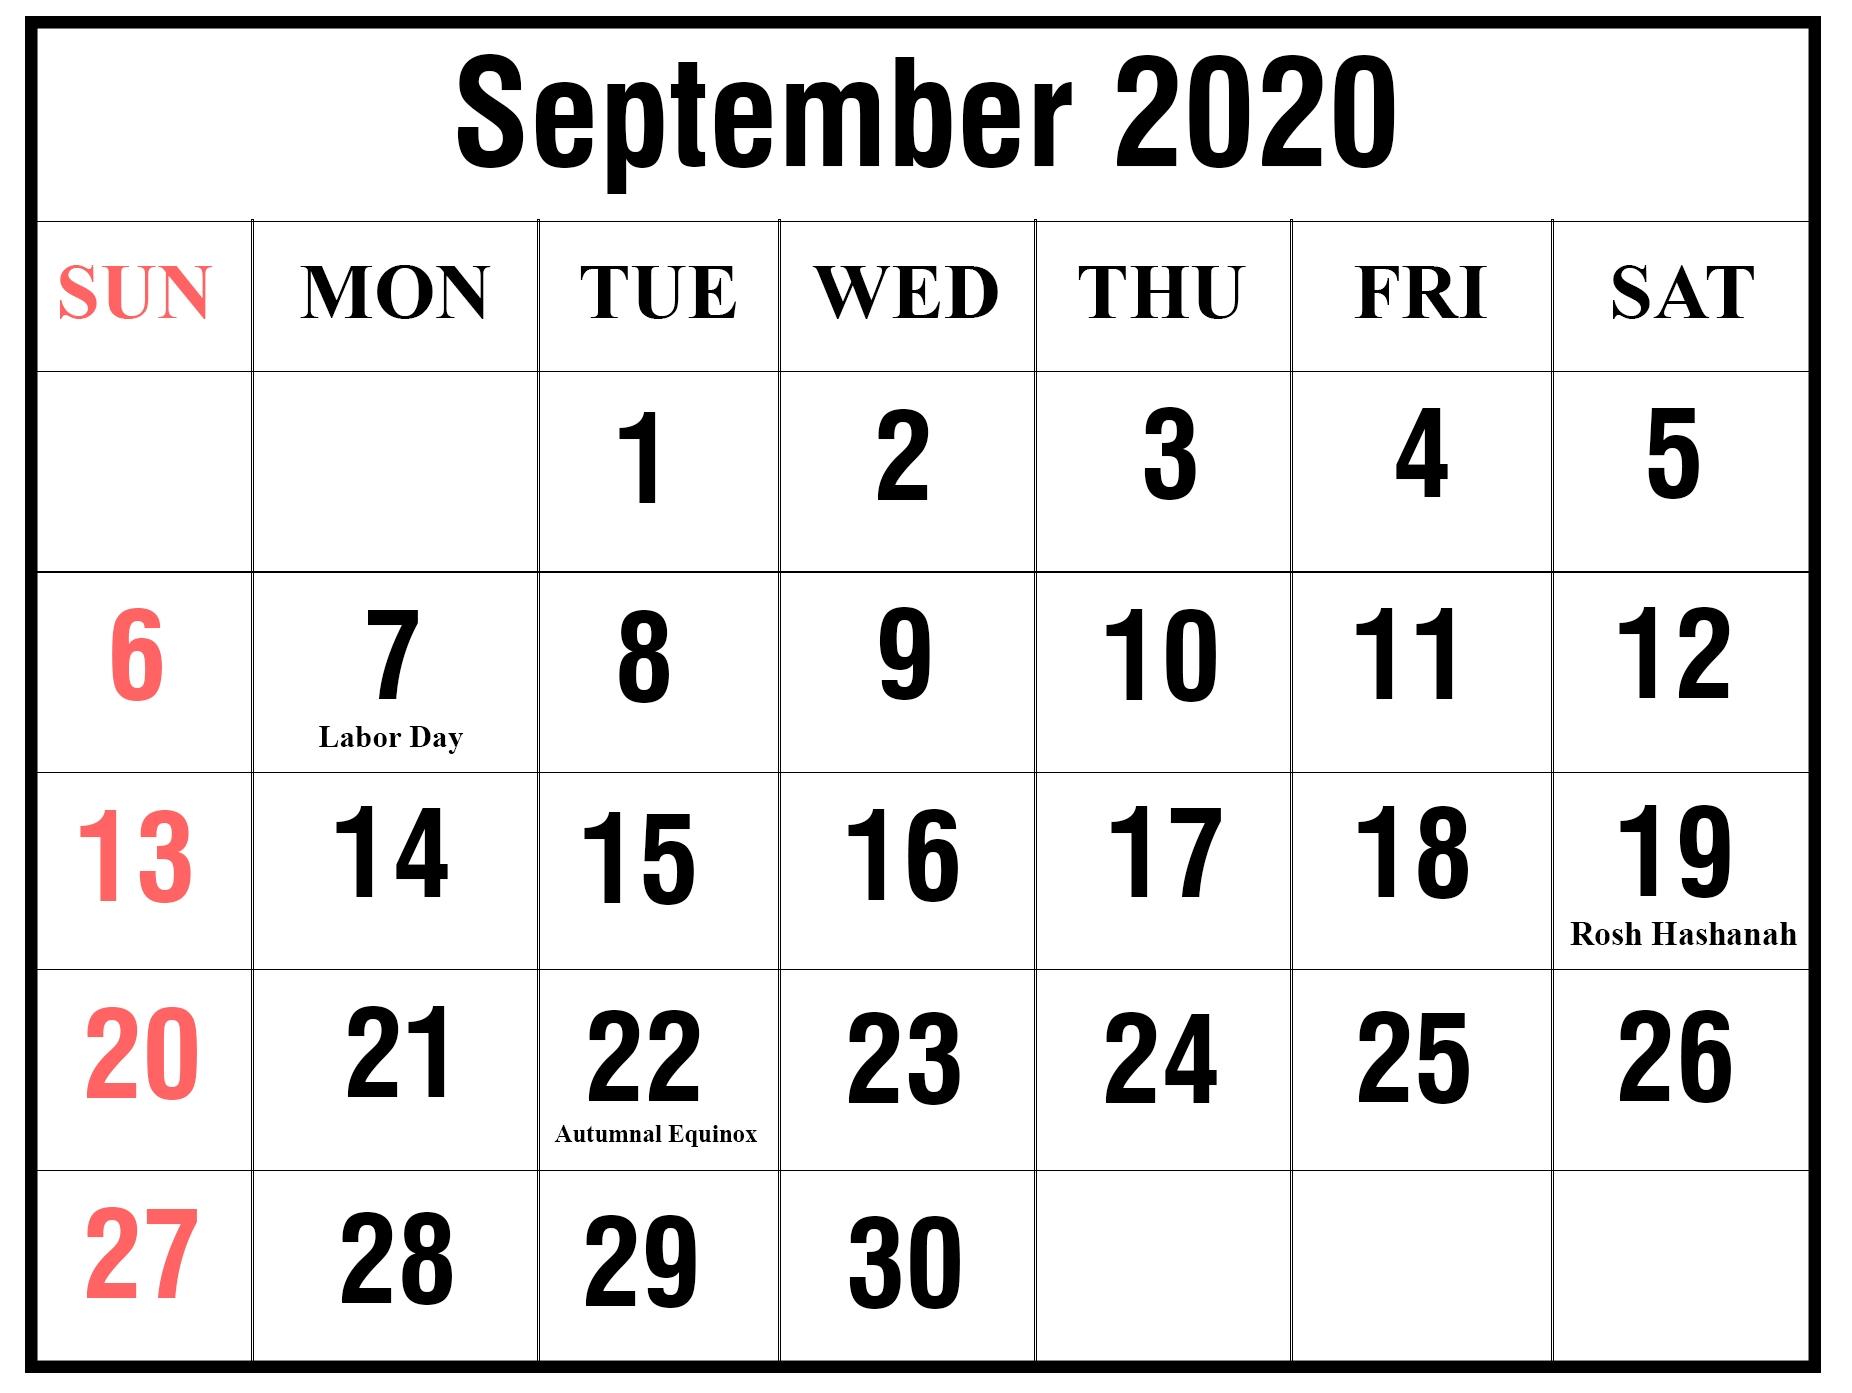 September 2020 Calendar Printable - Ko-Fi ❤️ Where